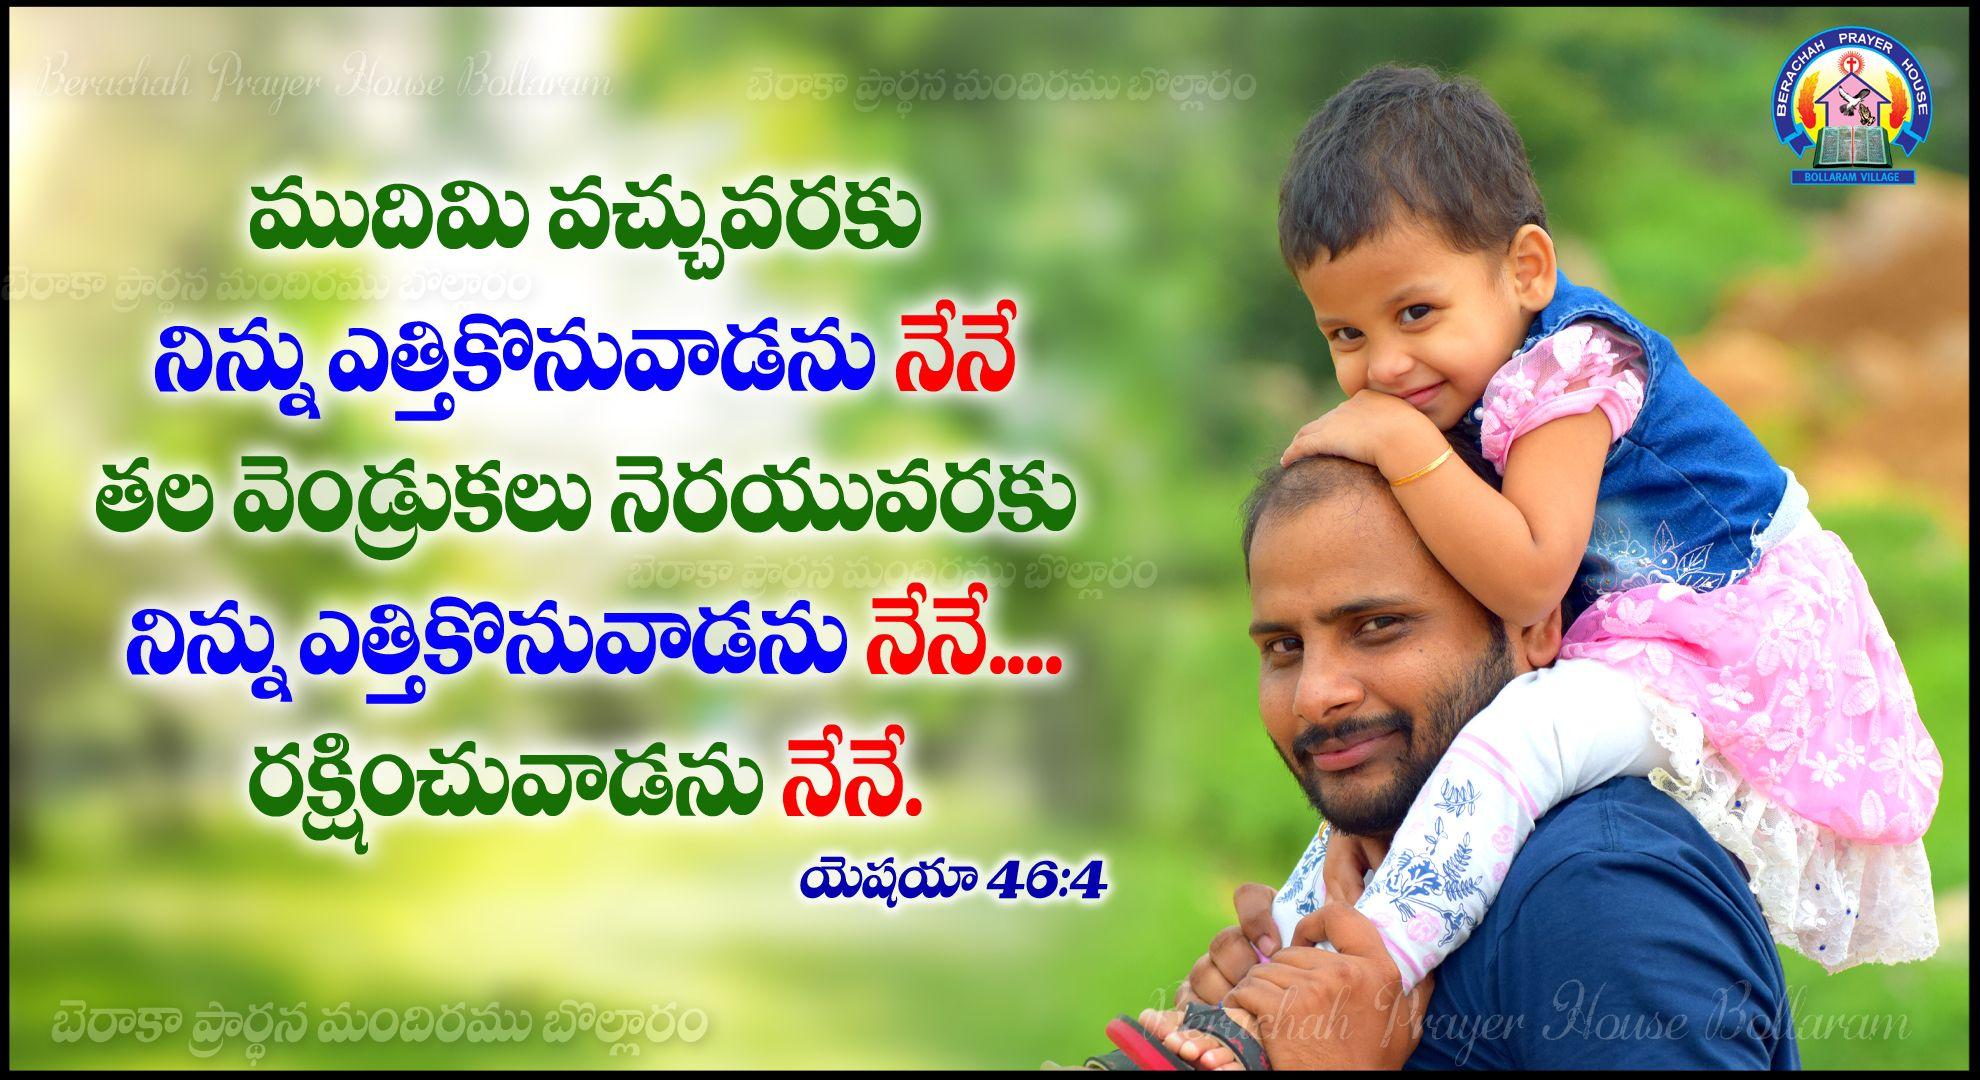 Berachah Telugu Christian Wallpapers Christian Wallpaper Christian Wallpaper